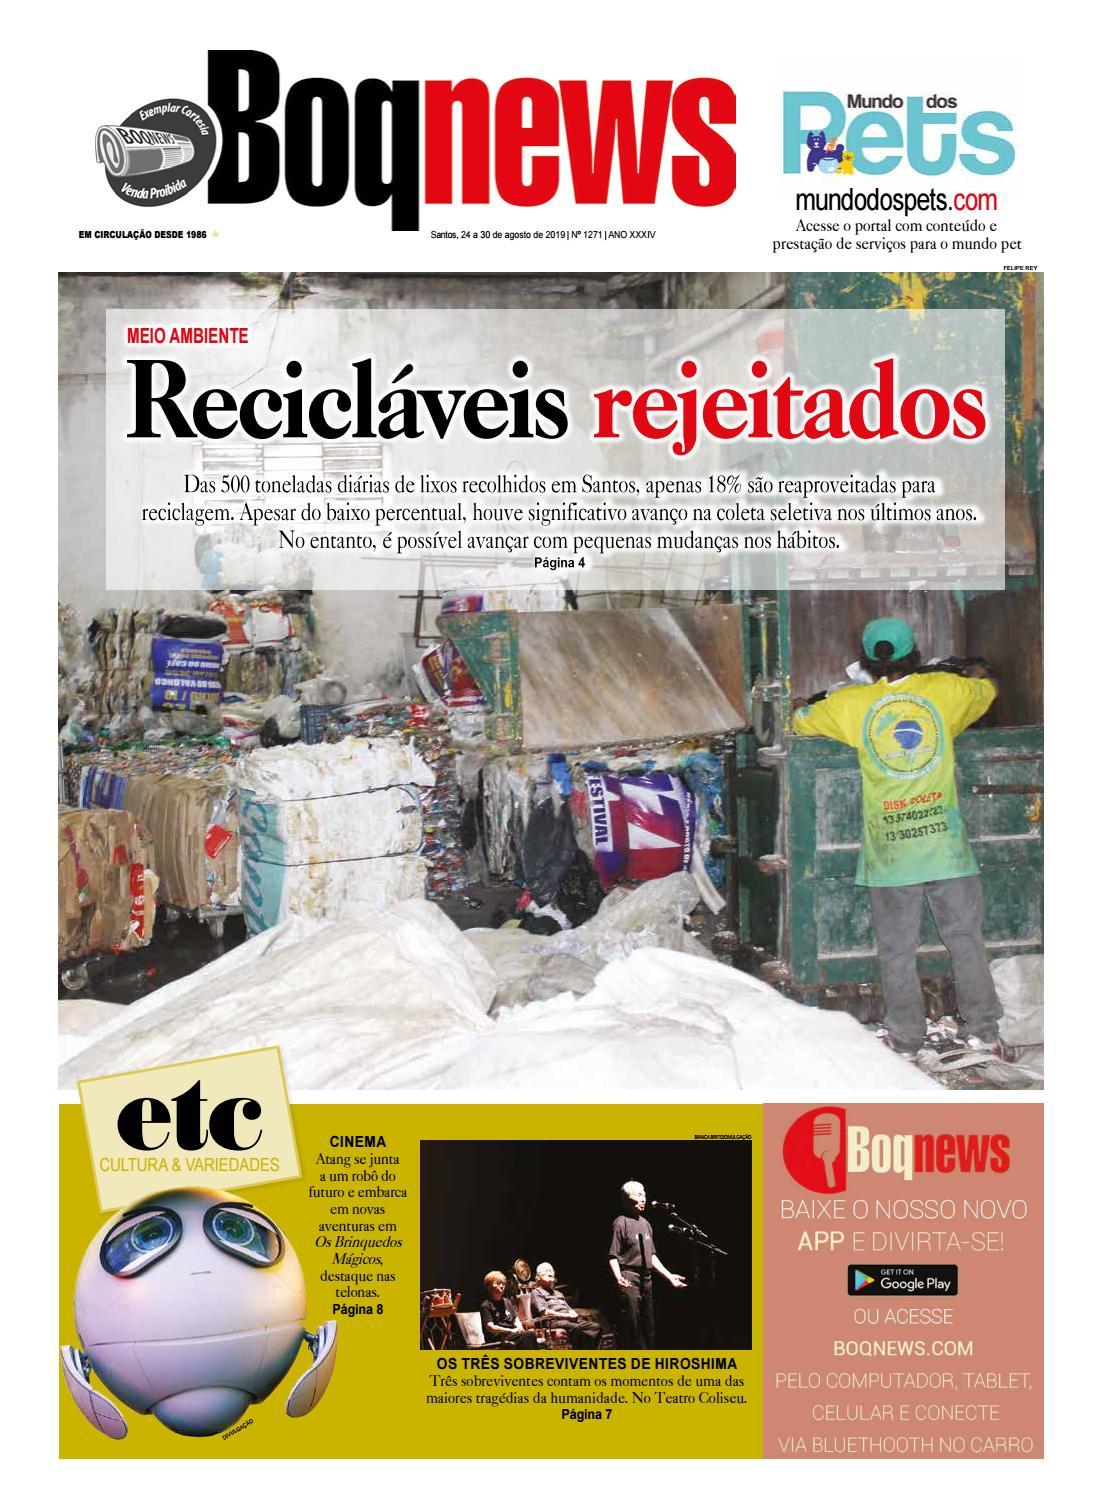 Jornal Boqnews Ed1271 de 24 a 30 08 19 by Jornal Boqnews - issuu